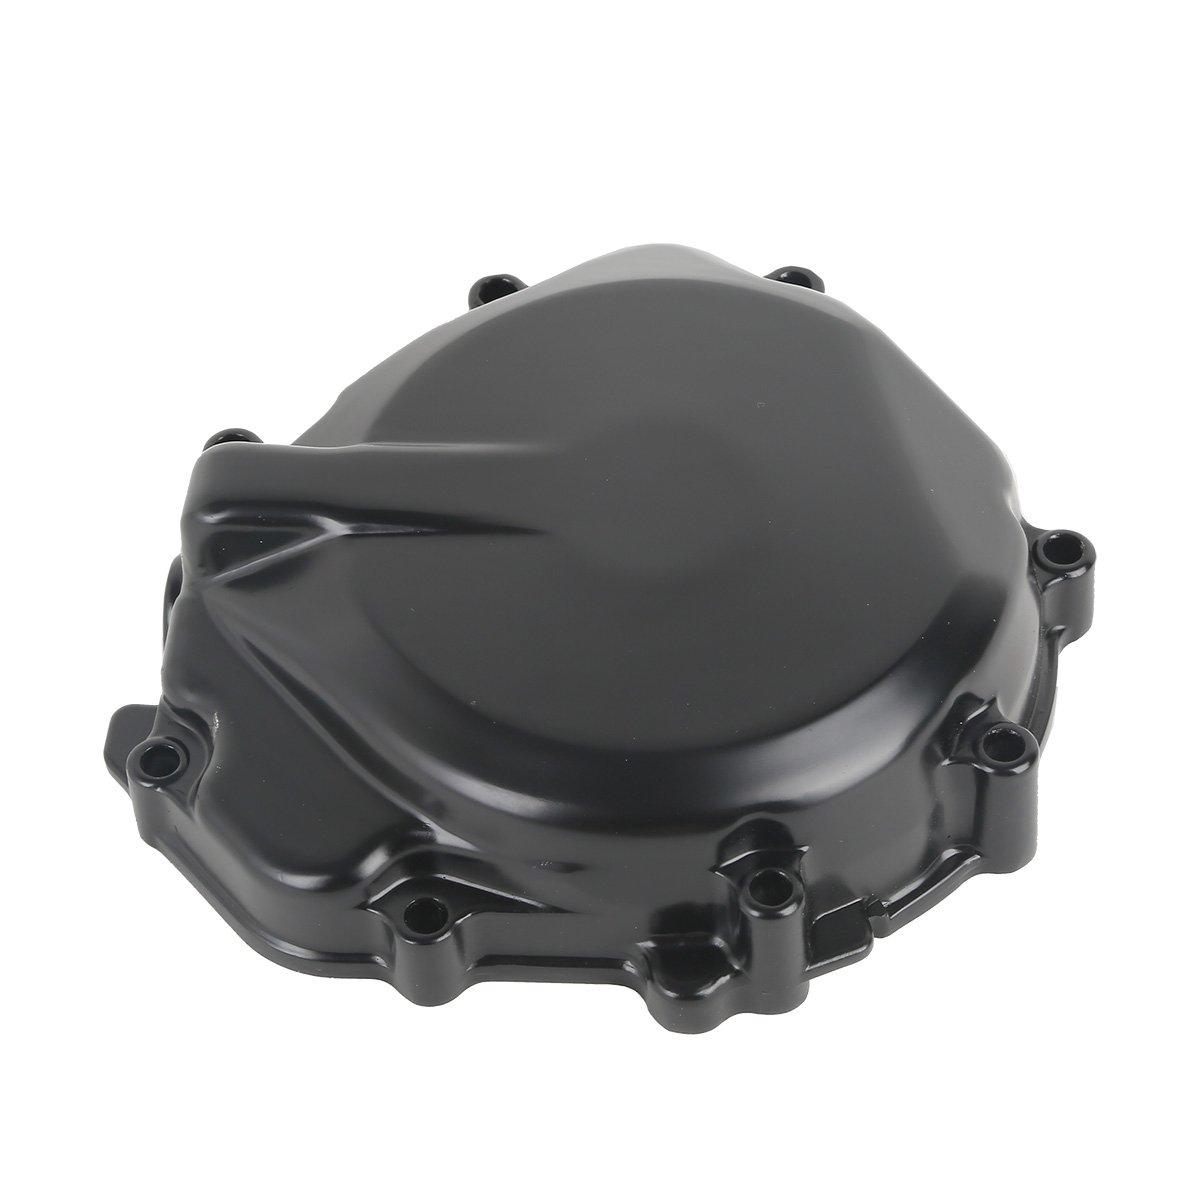 XMT-MOTO Left Crankcase Engine Stator Cover for SUZUKI GSXR1000 2005-2008,Black